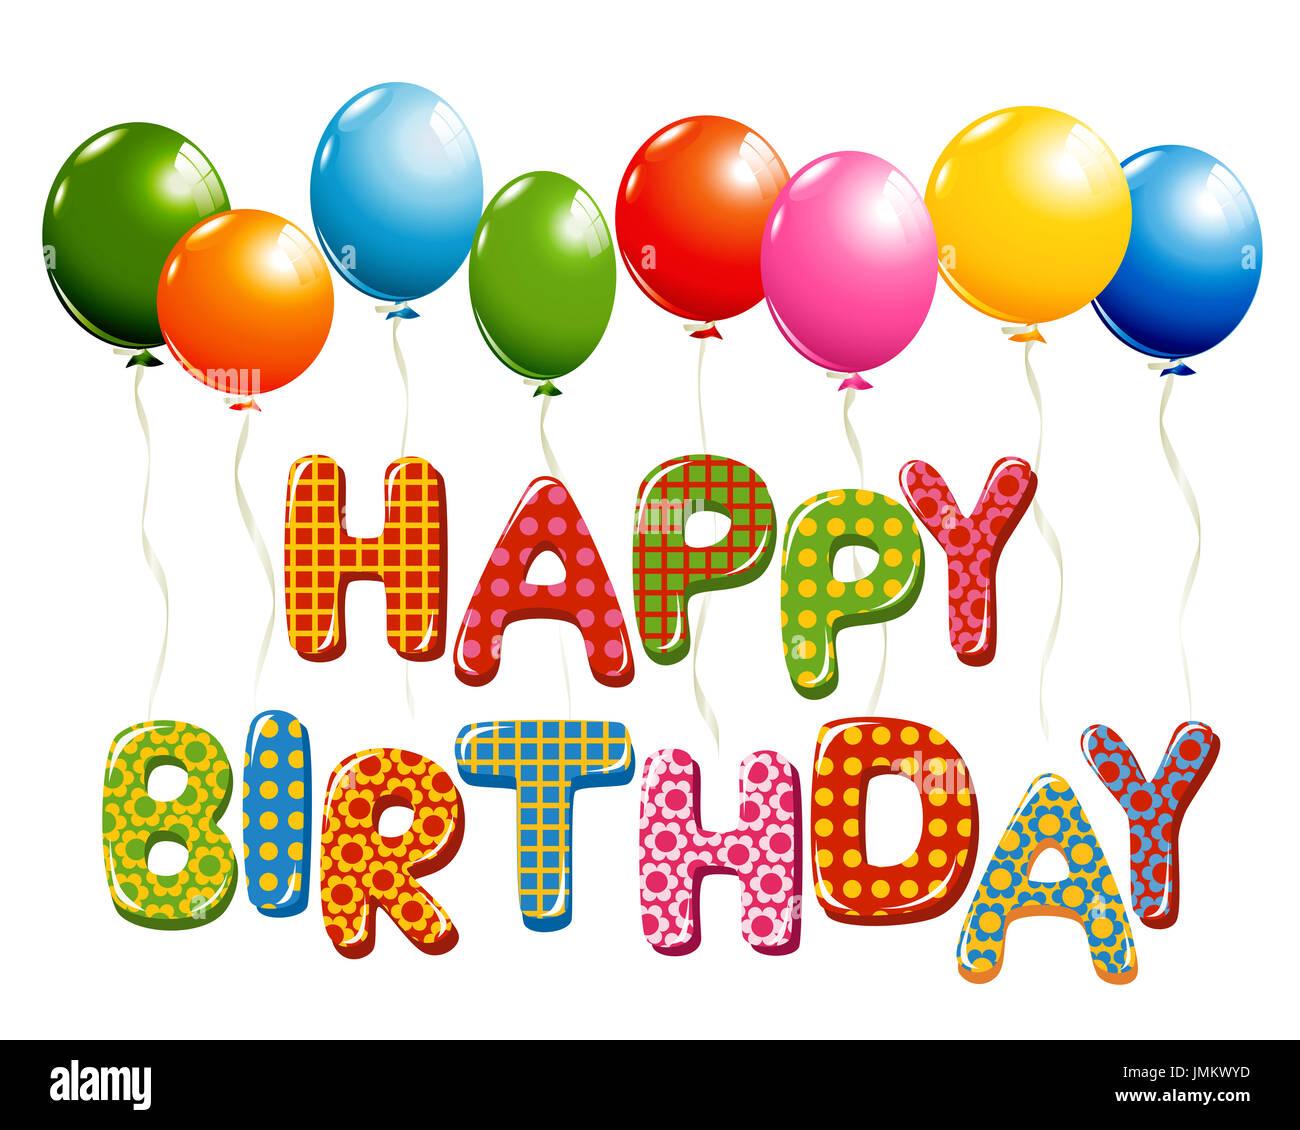 happy birthday letters mit luftballons stockfoto bild 150413521 alamy. Black Bedroom Furniture Sets. Home Design Ideas